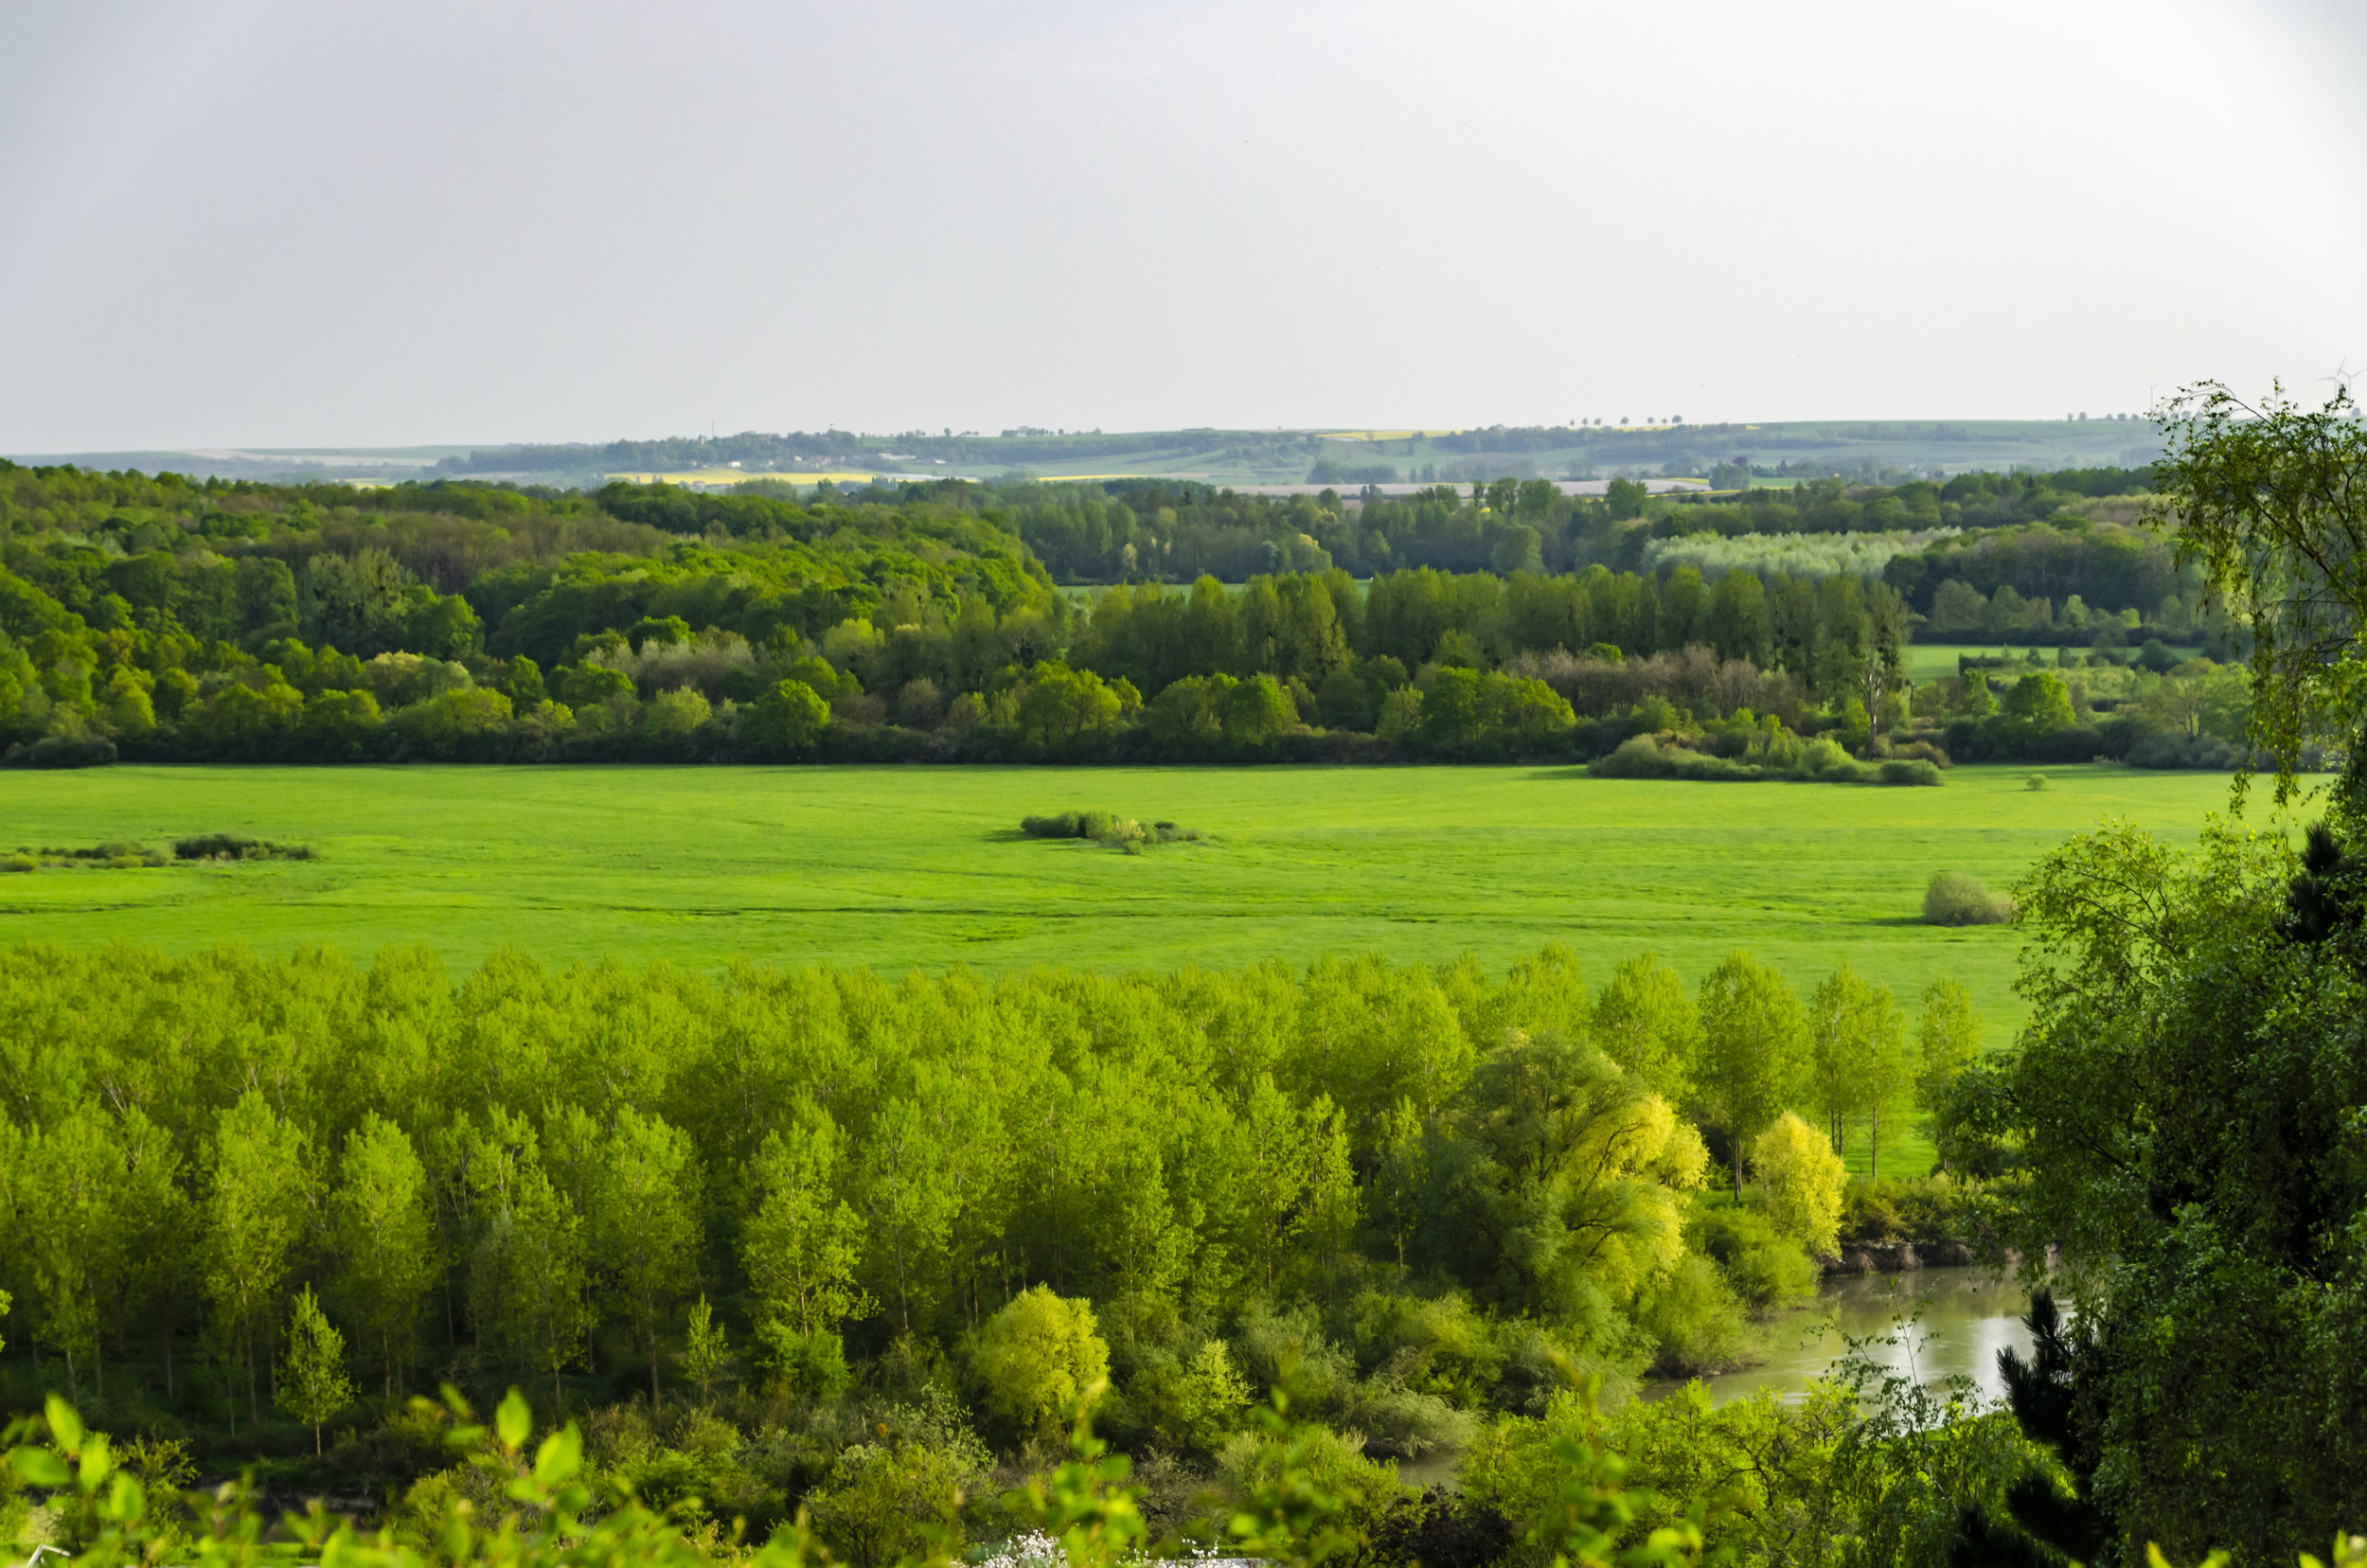 Forest Ferme Overlook at Voncq, France. Photo by Sarah Elisabeth Sawyer